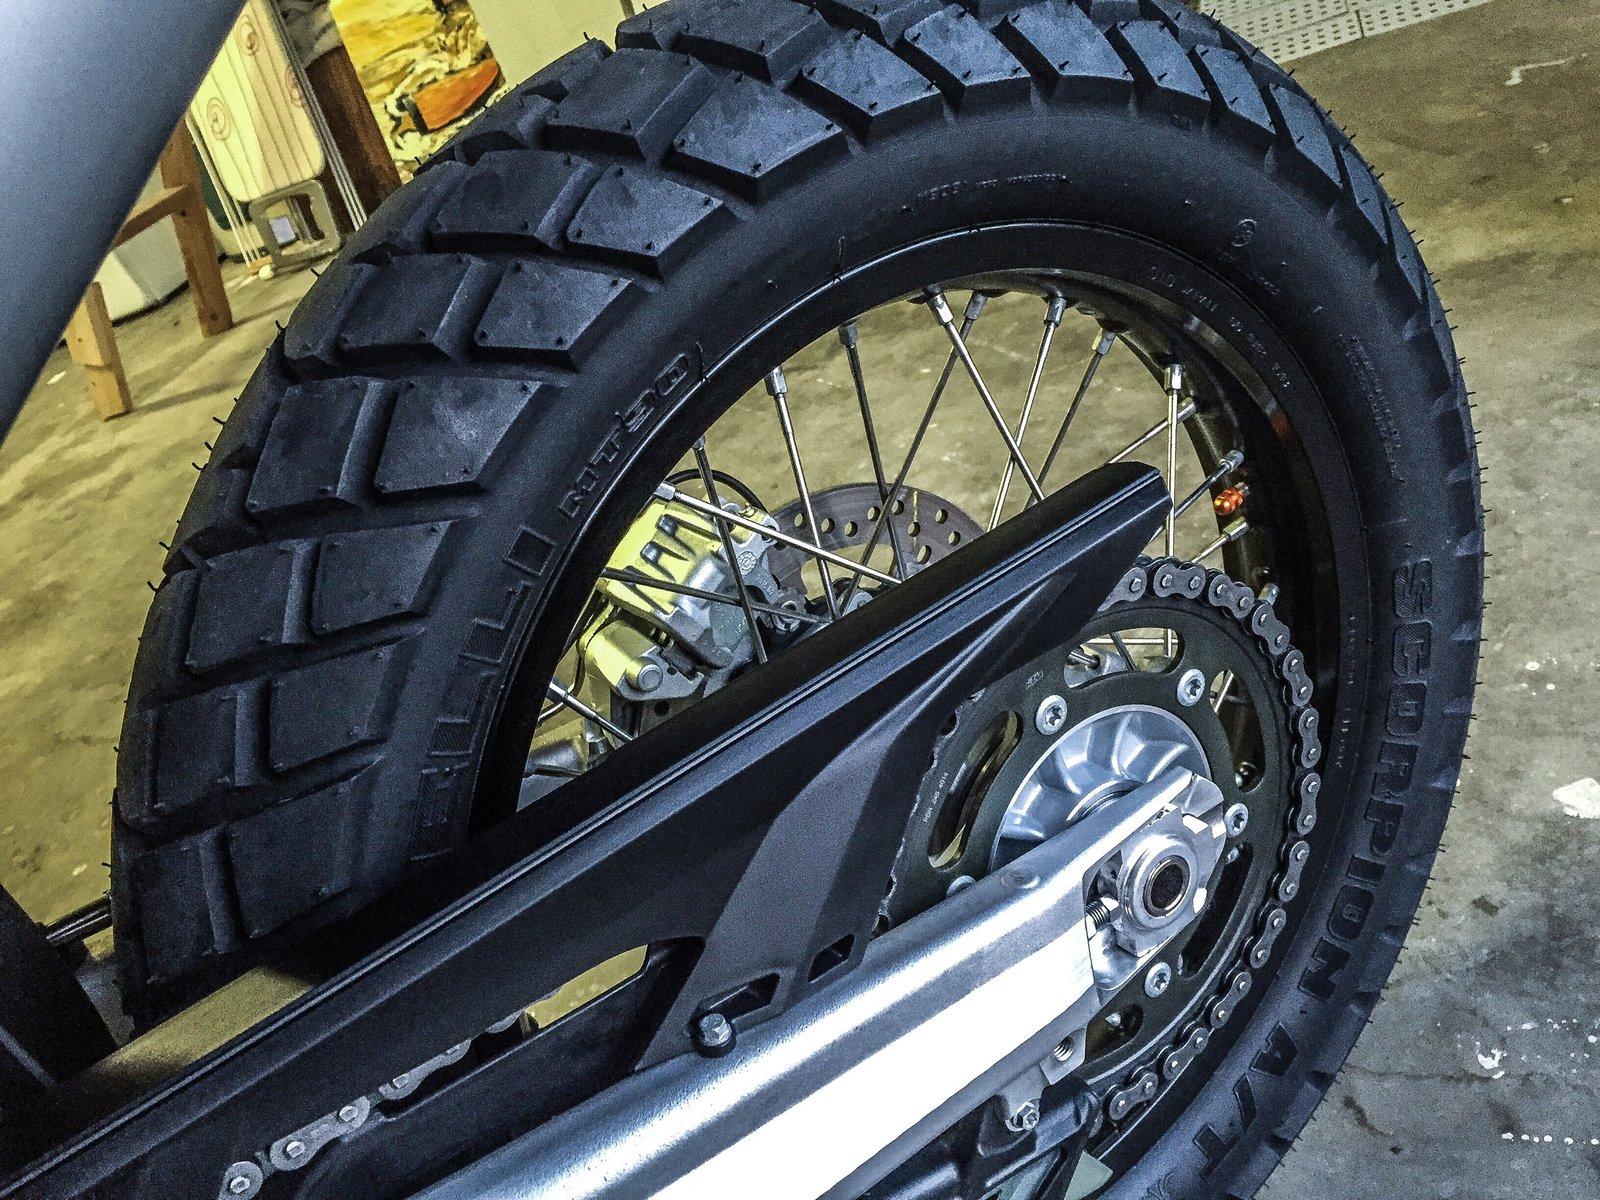 Blue Ridge Tire >> New rubber for the Blue Ridge - Pirelli Scorpion MT 90 A/T | South Bay Riders